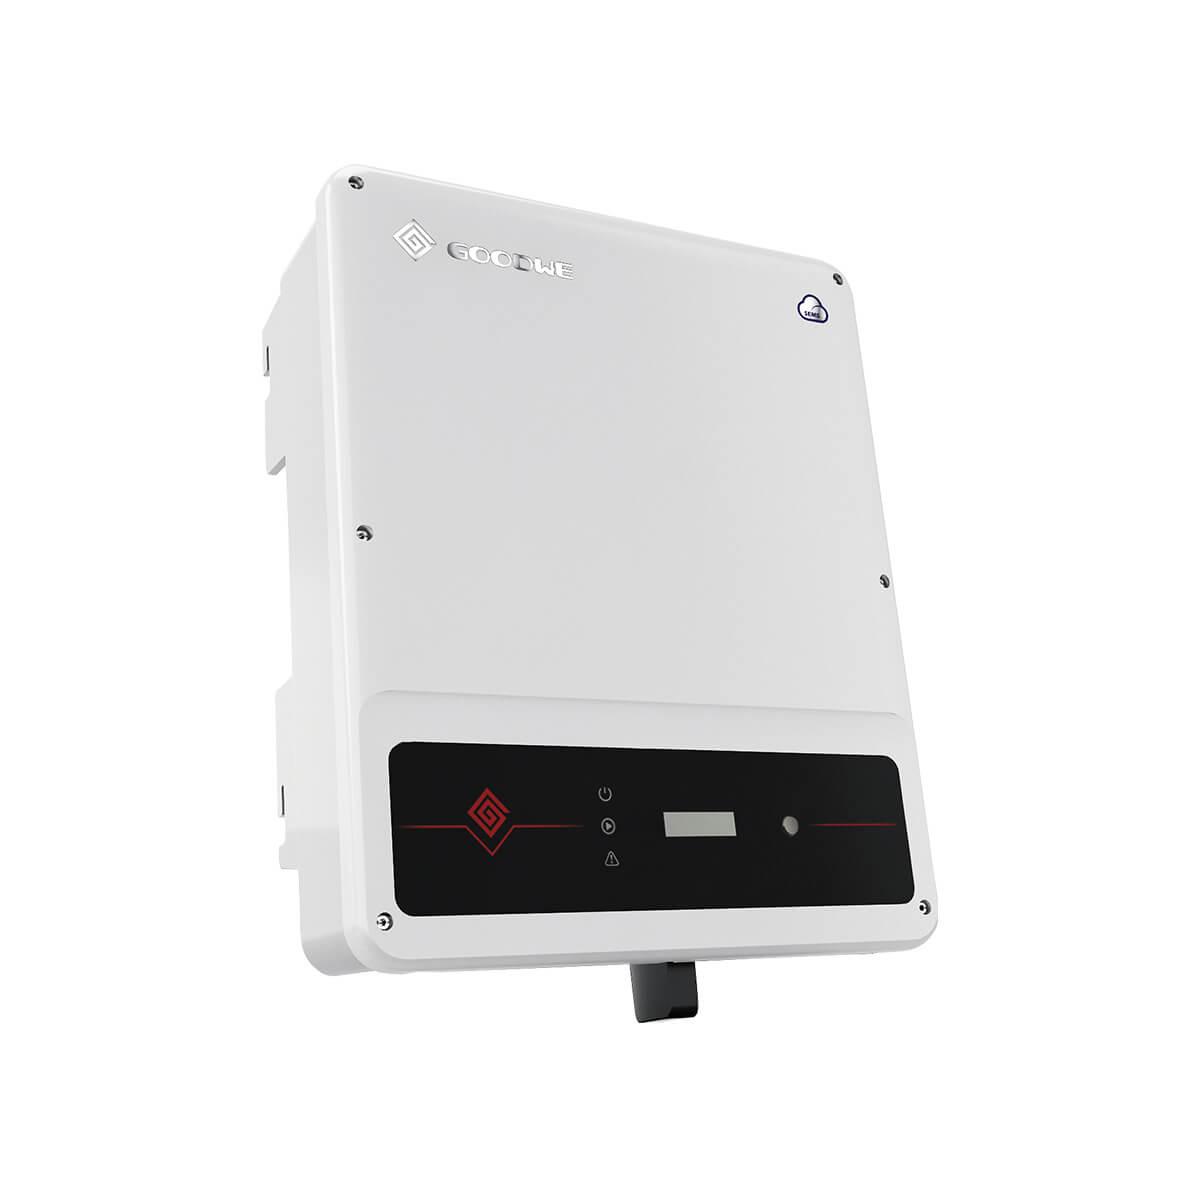 goodwe 20kW inverter, goodwe gw20kt-dt 20kW inverter, goodwe gw20kt-dt inverter, goodwe gw20kt-dt, goodwe 20 kW